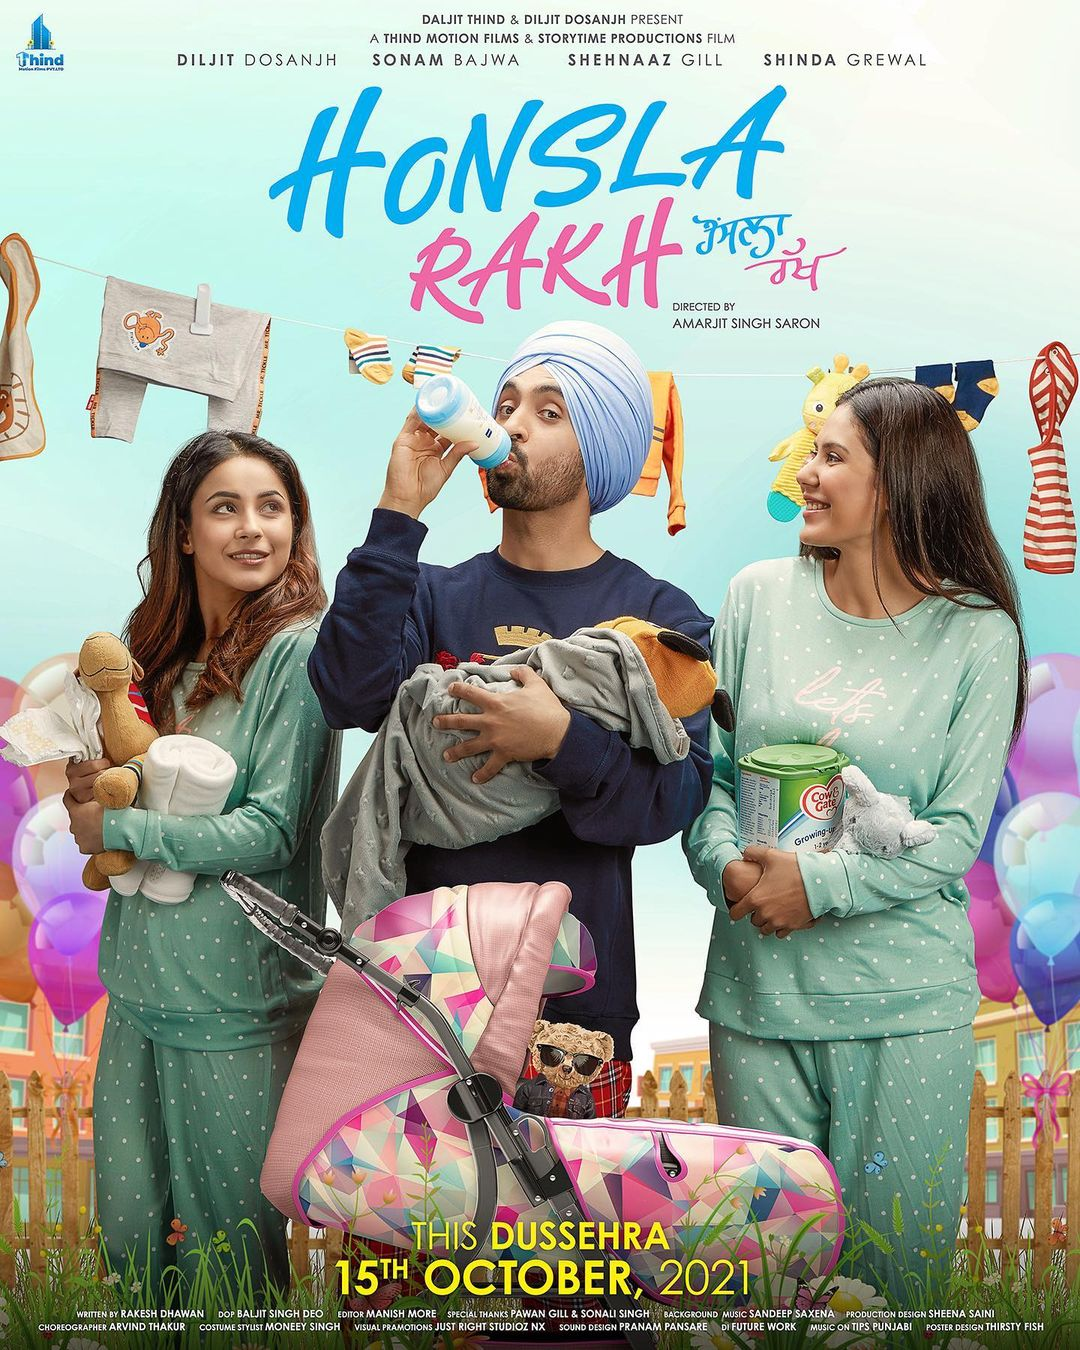 Fans shower love for Shehnaaz Gill as Honsla Rakh poster revealed after Sidharth Shuklas death